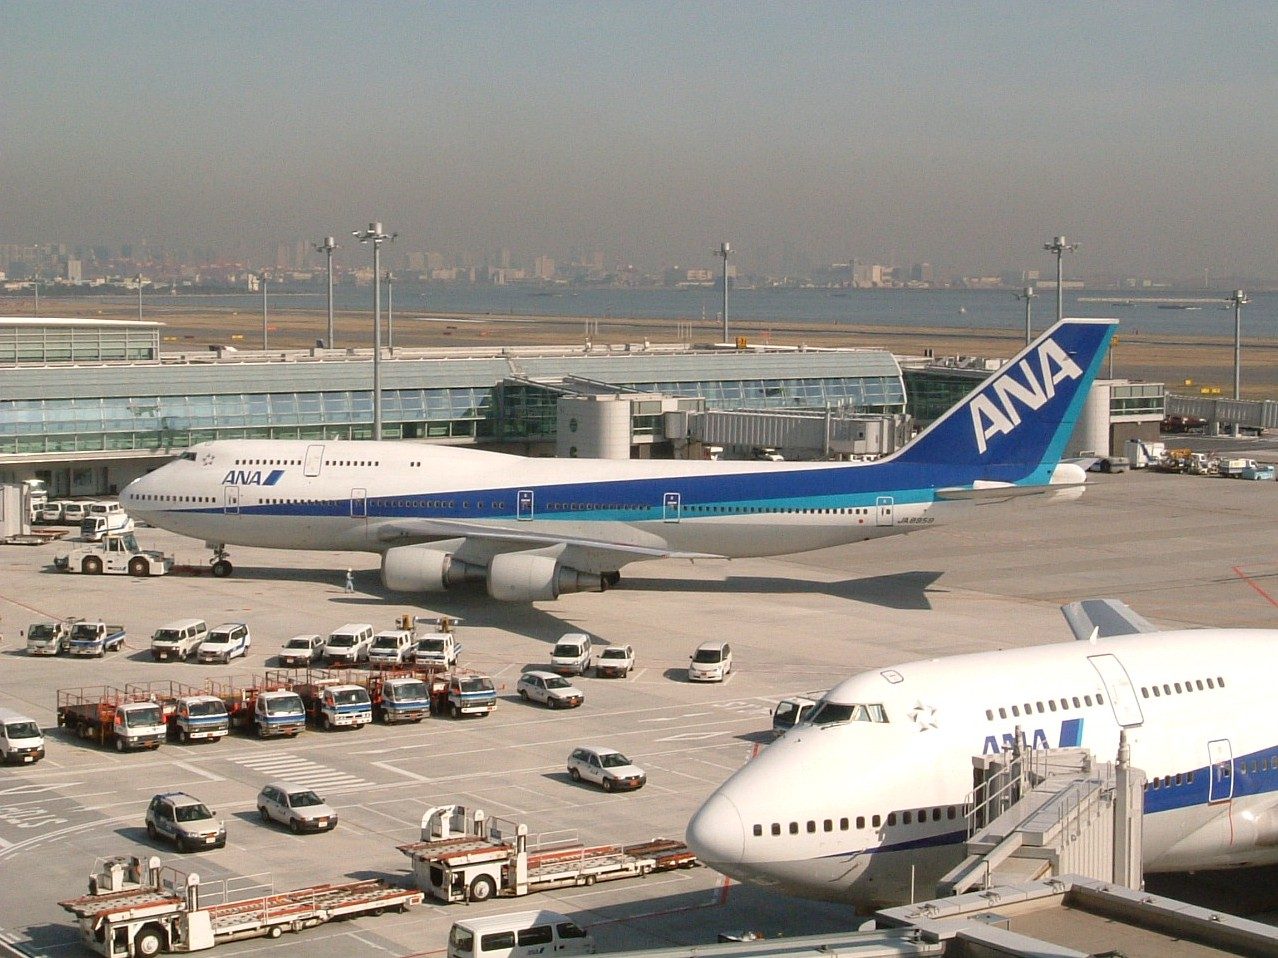 ANA 747400D